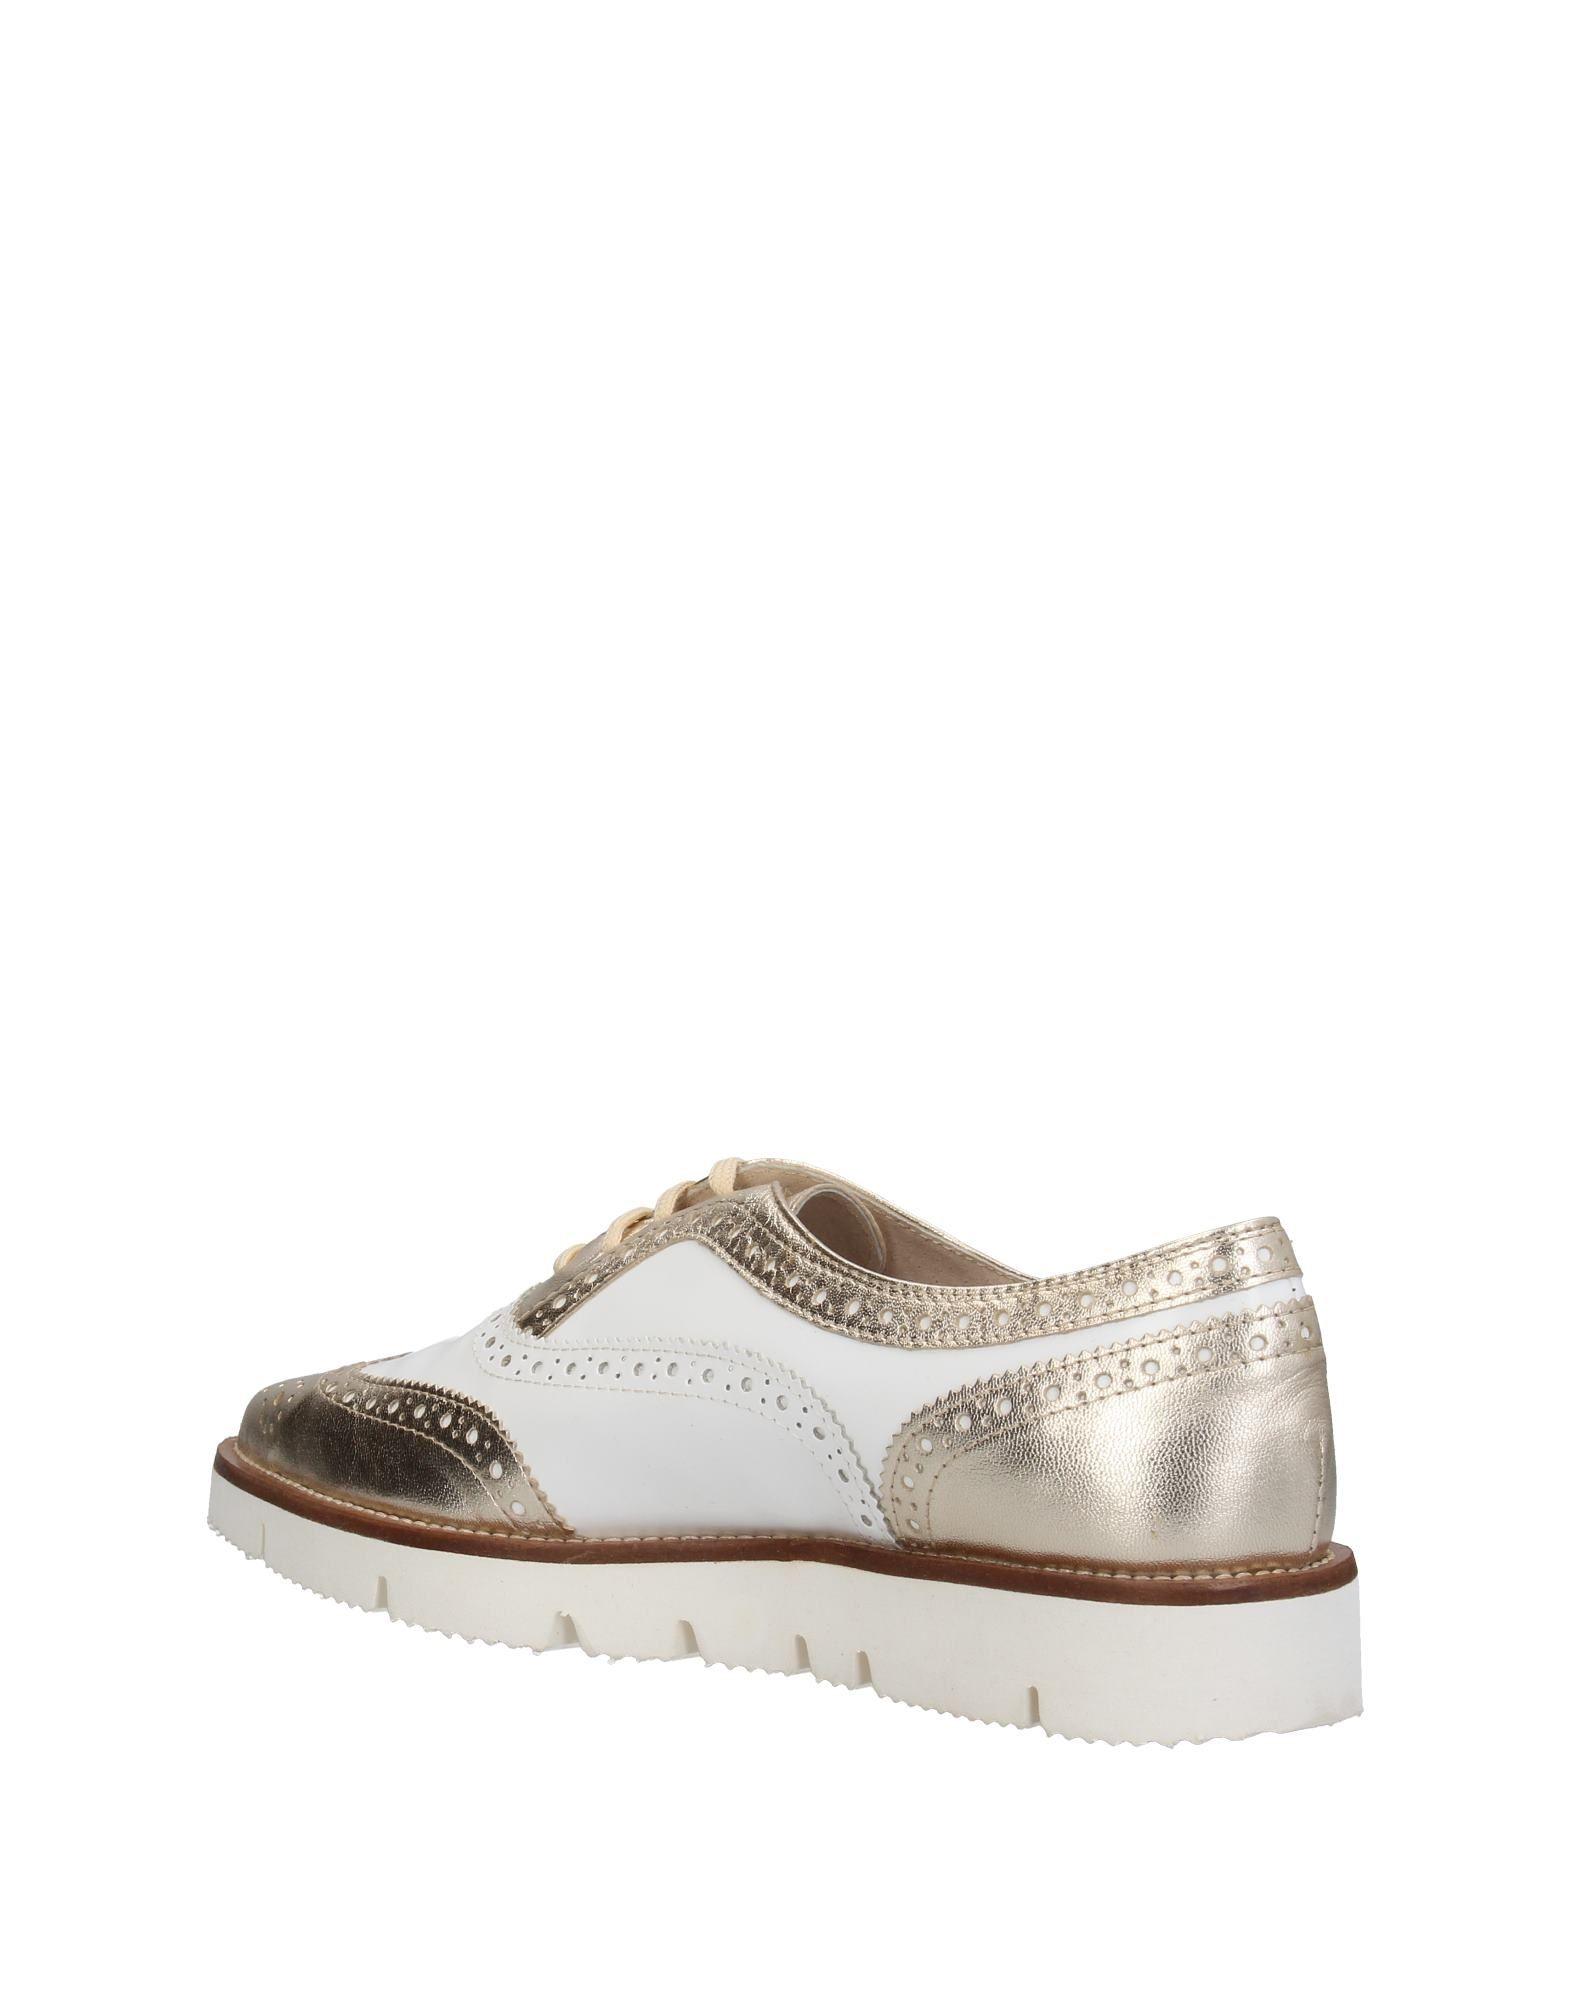 Ovye' By  Cristina Lucchi Schnürschuhe Damen  By 11374295NU Gute Qualität beliebte Schuhe e59f75